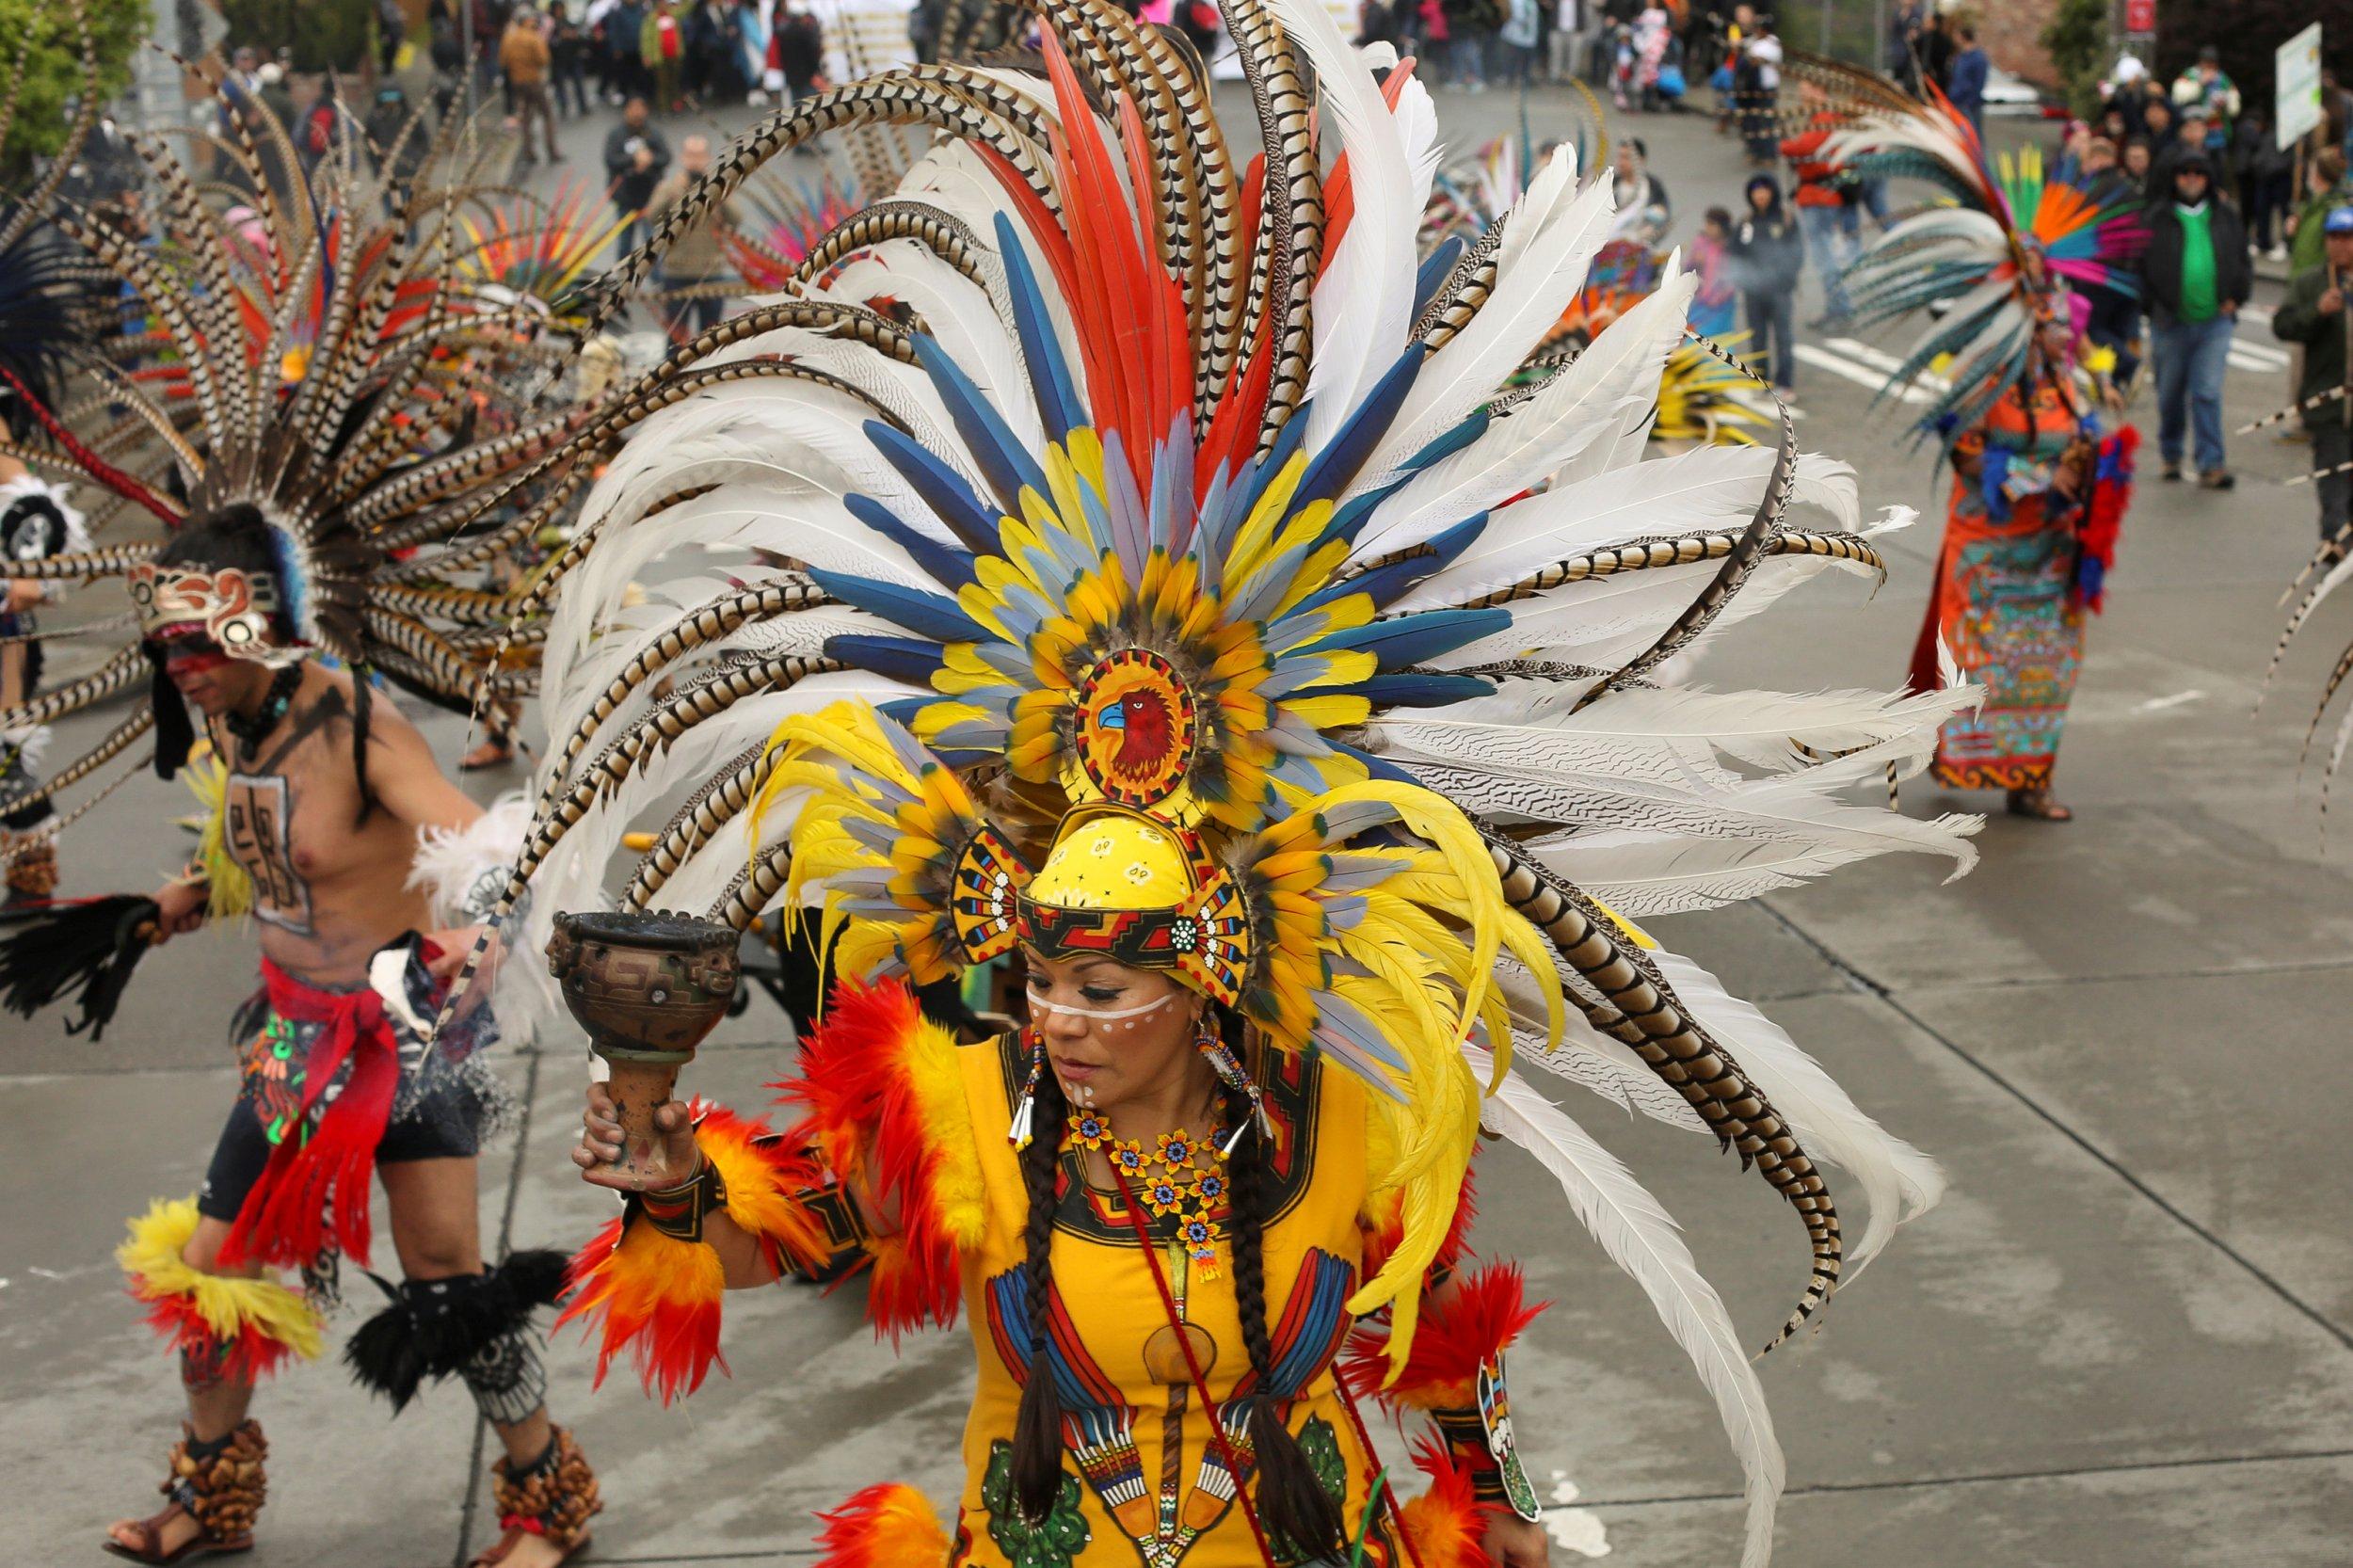 Traditional Aztec dance